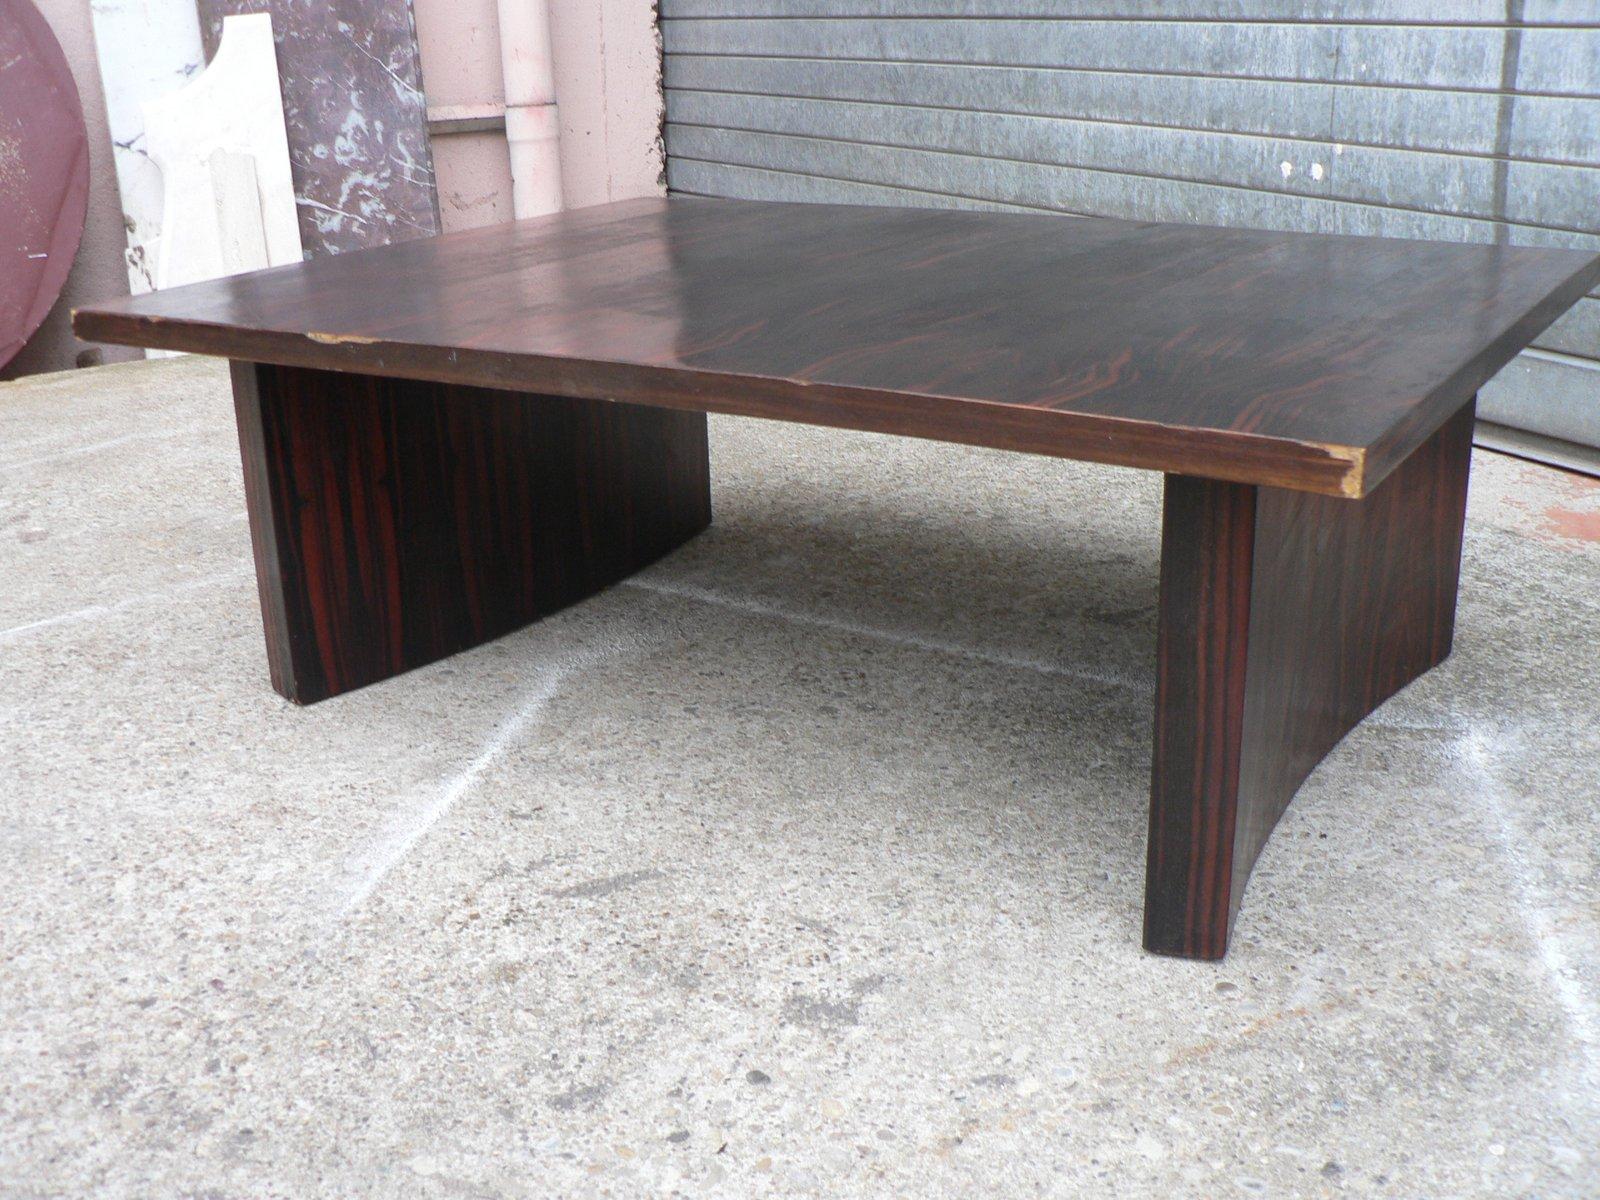 art d co makassarholz couchtisch bei pamono kaufen. Black Bedroom Furniture Sets. Home Design Ideas